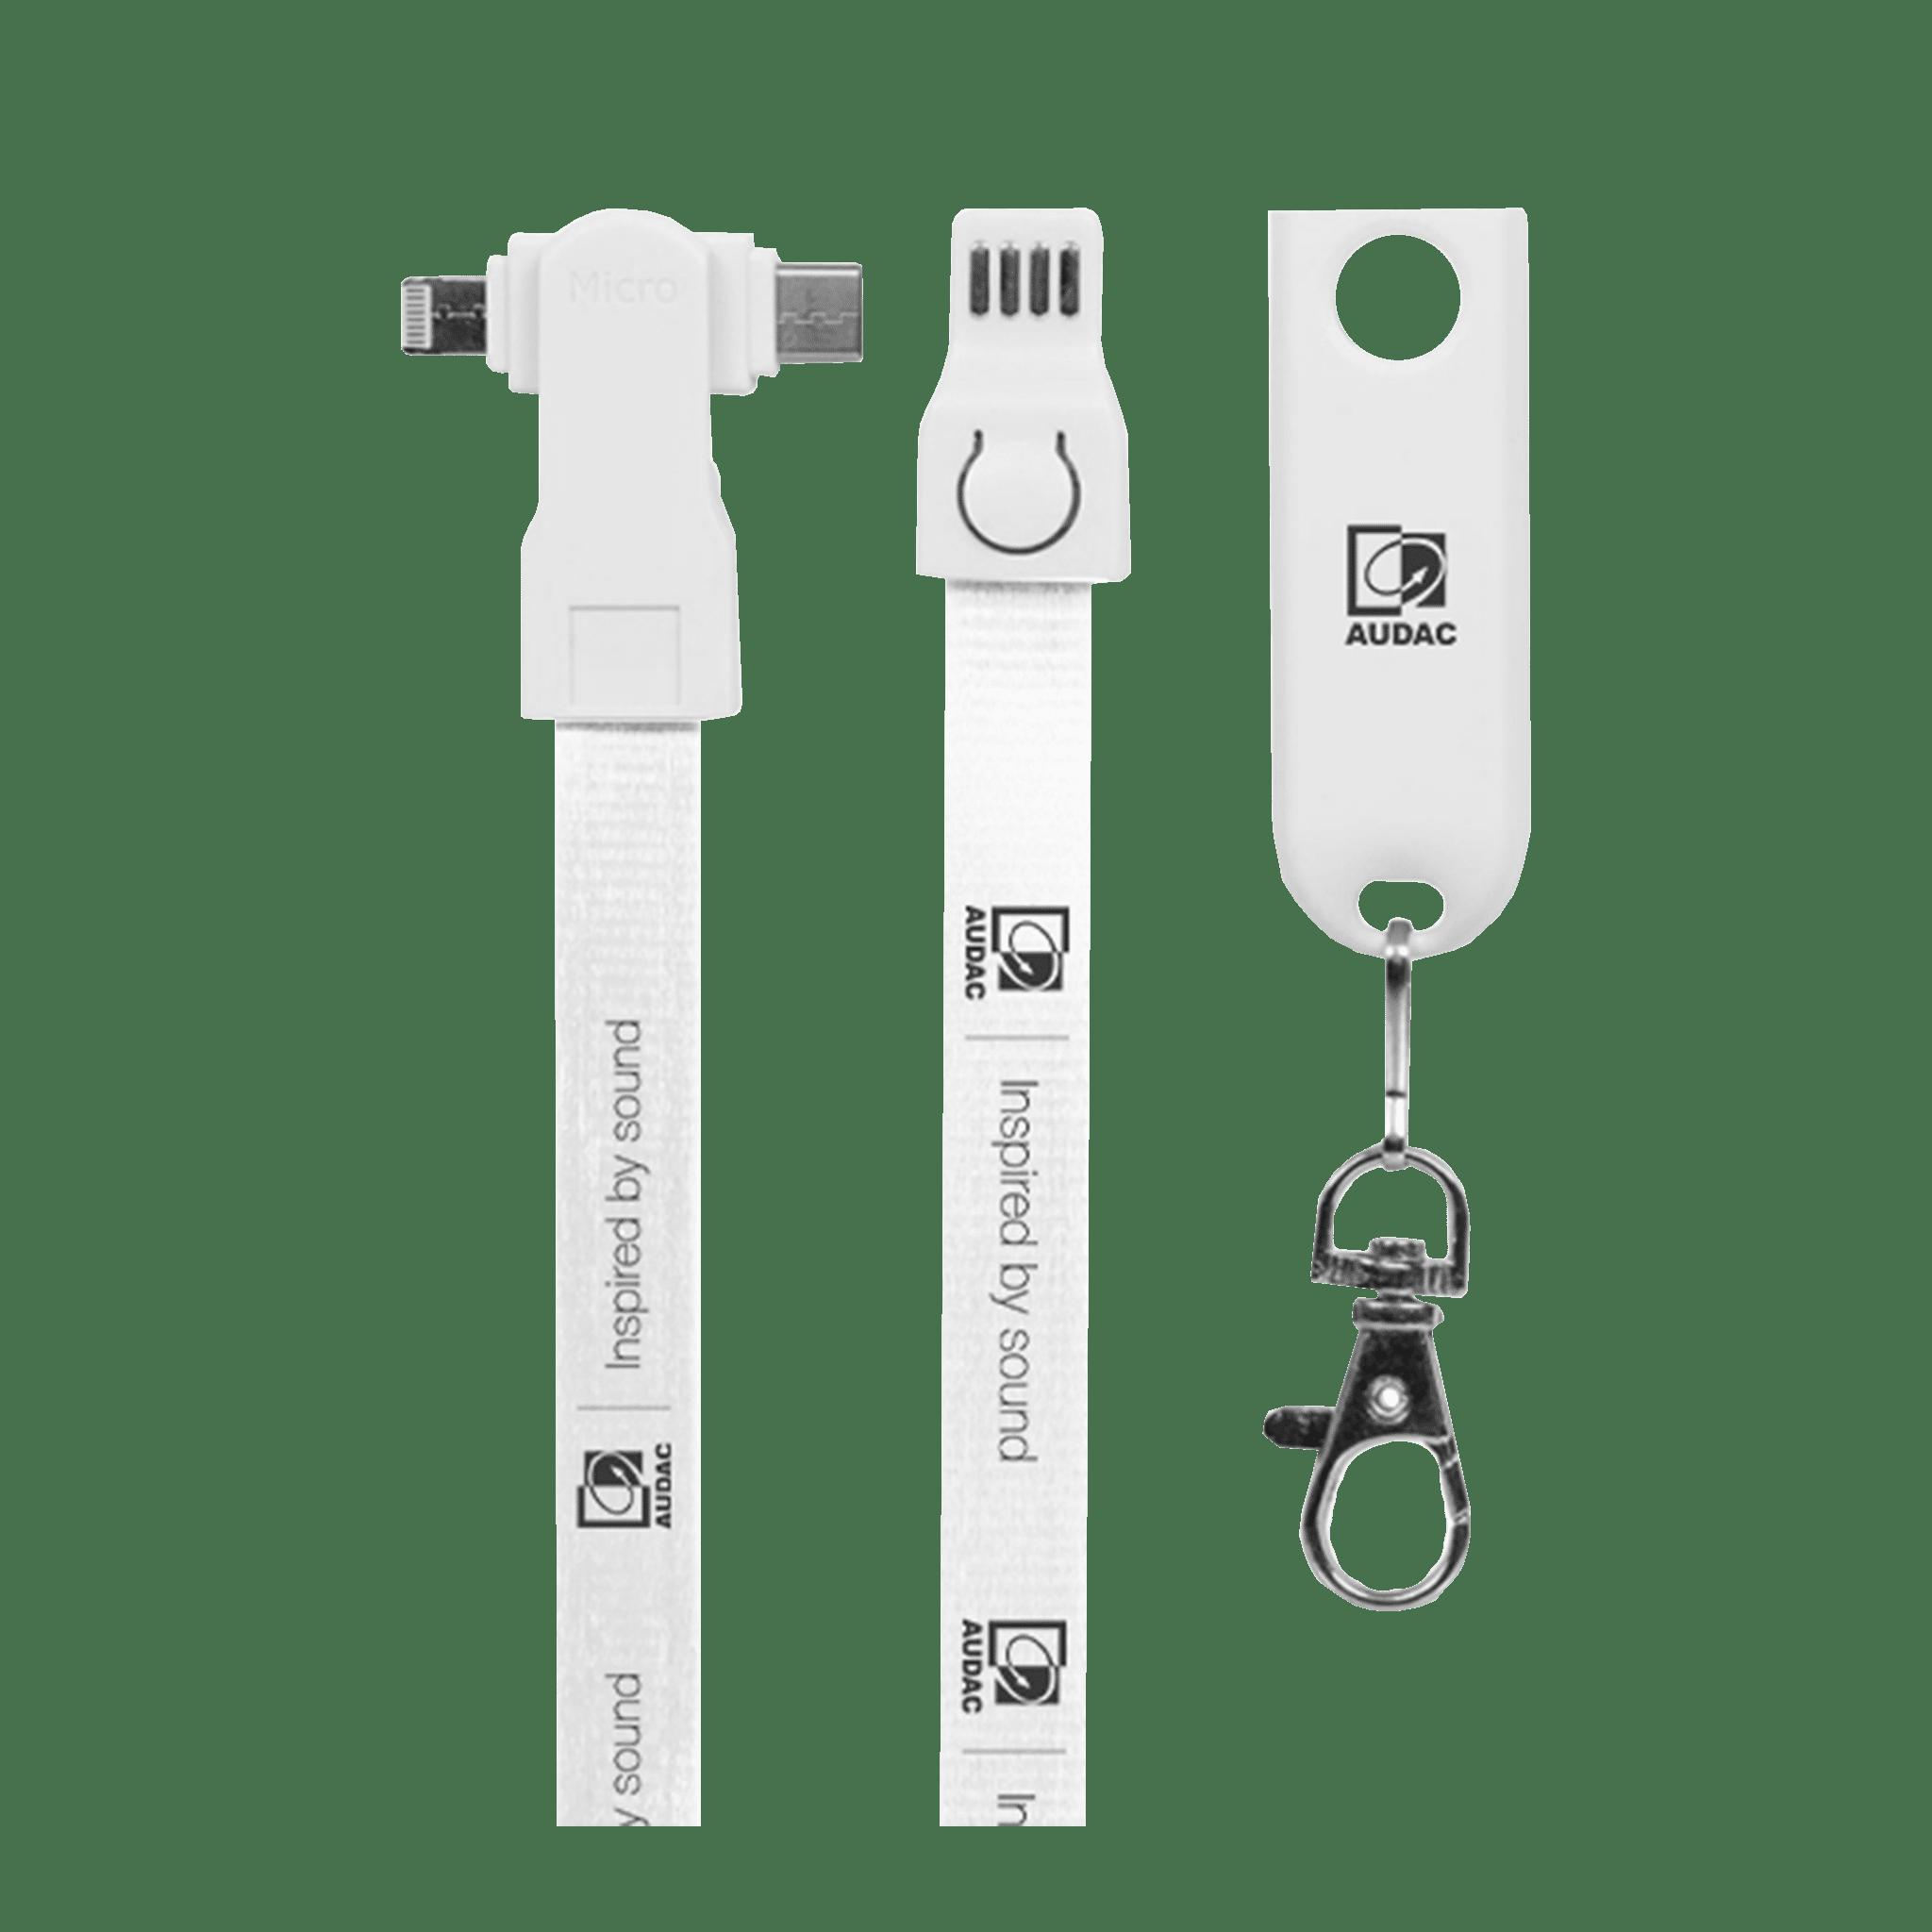 PROMO5571 - AUDAC USB charging lanyard 3-in-1